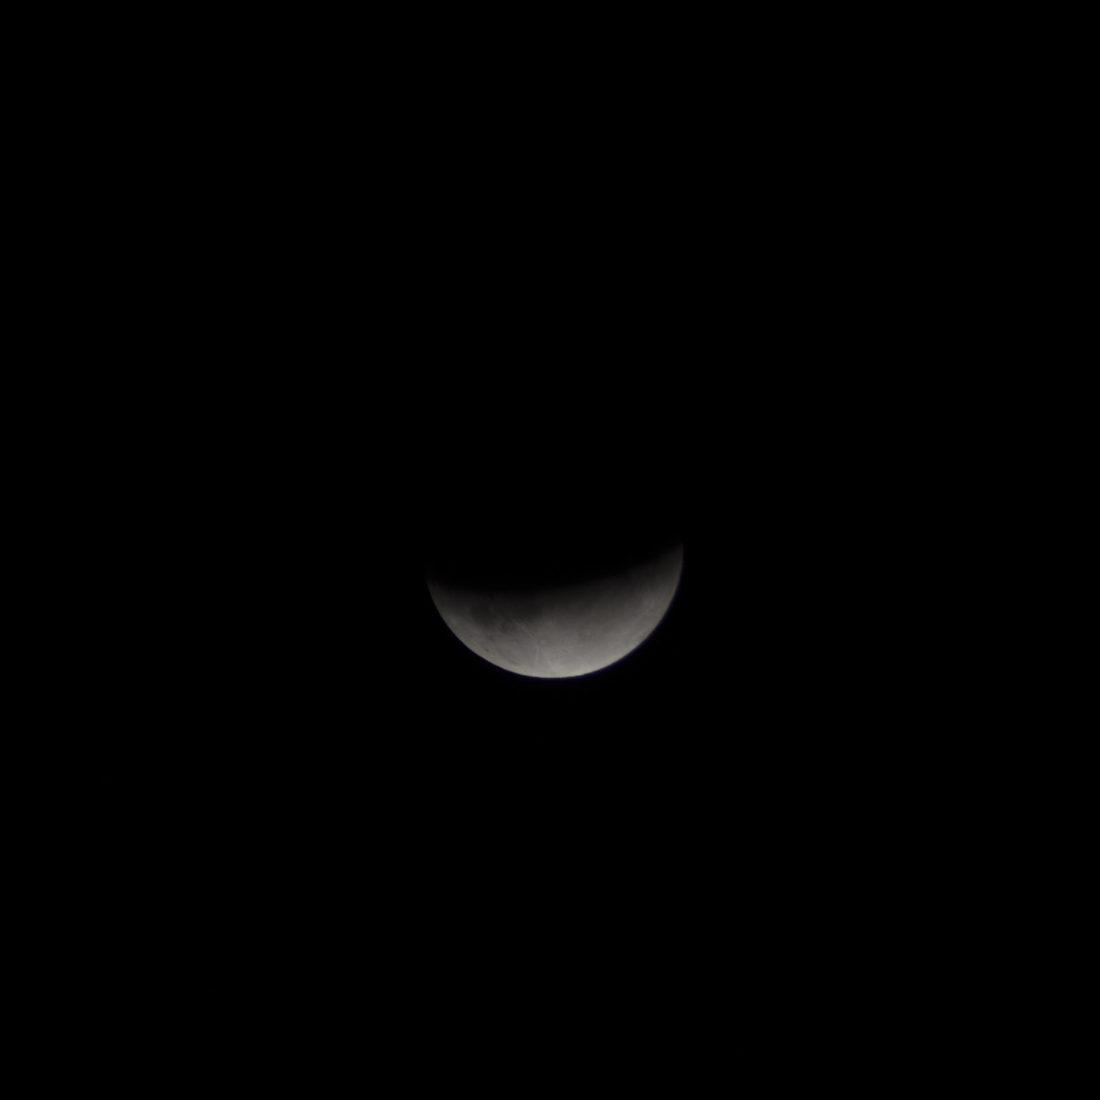 Luna eclissi 16 luglio 2019 © Valentina Cinelli